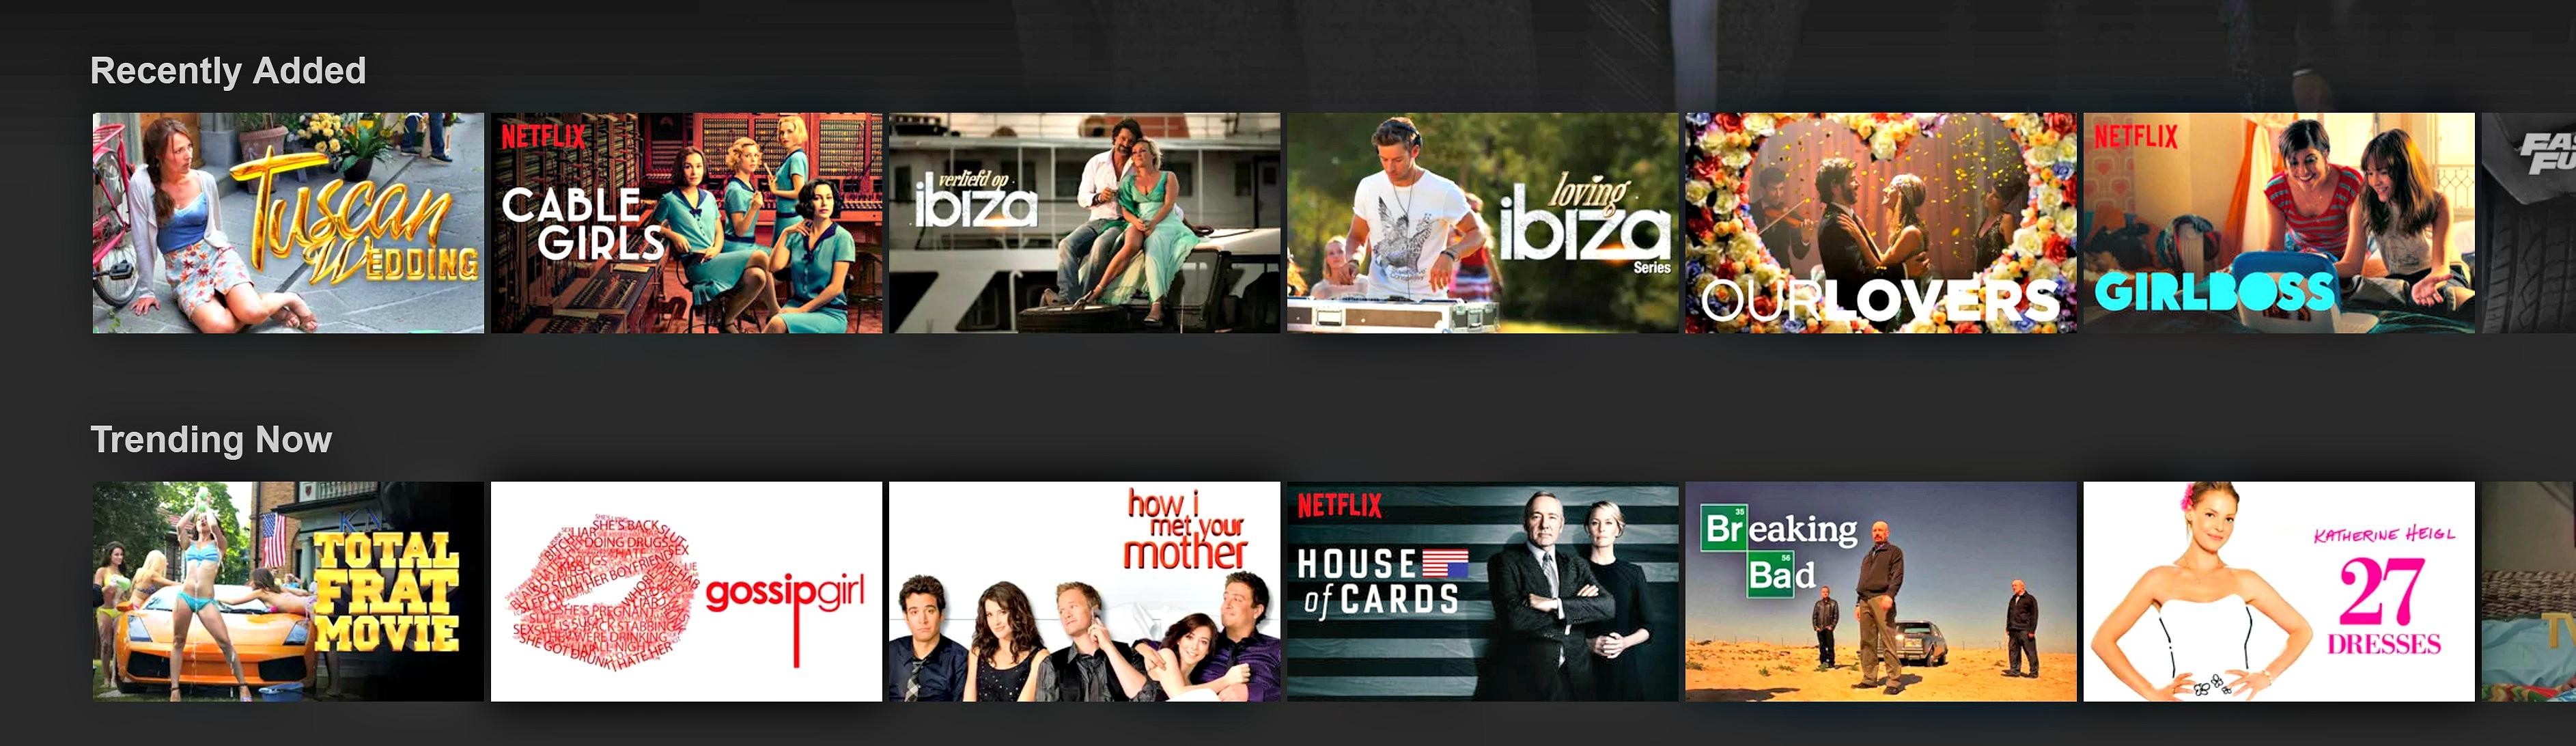 Nederlandse films en series op Netflix